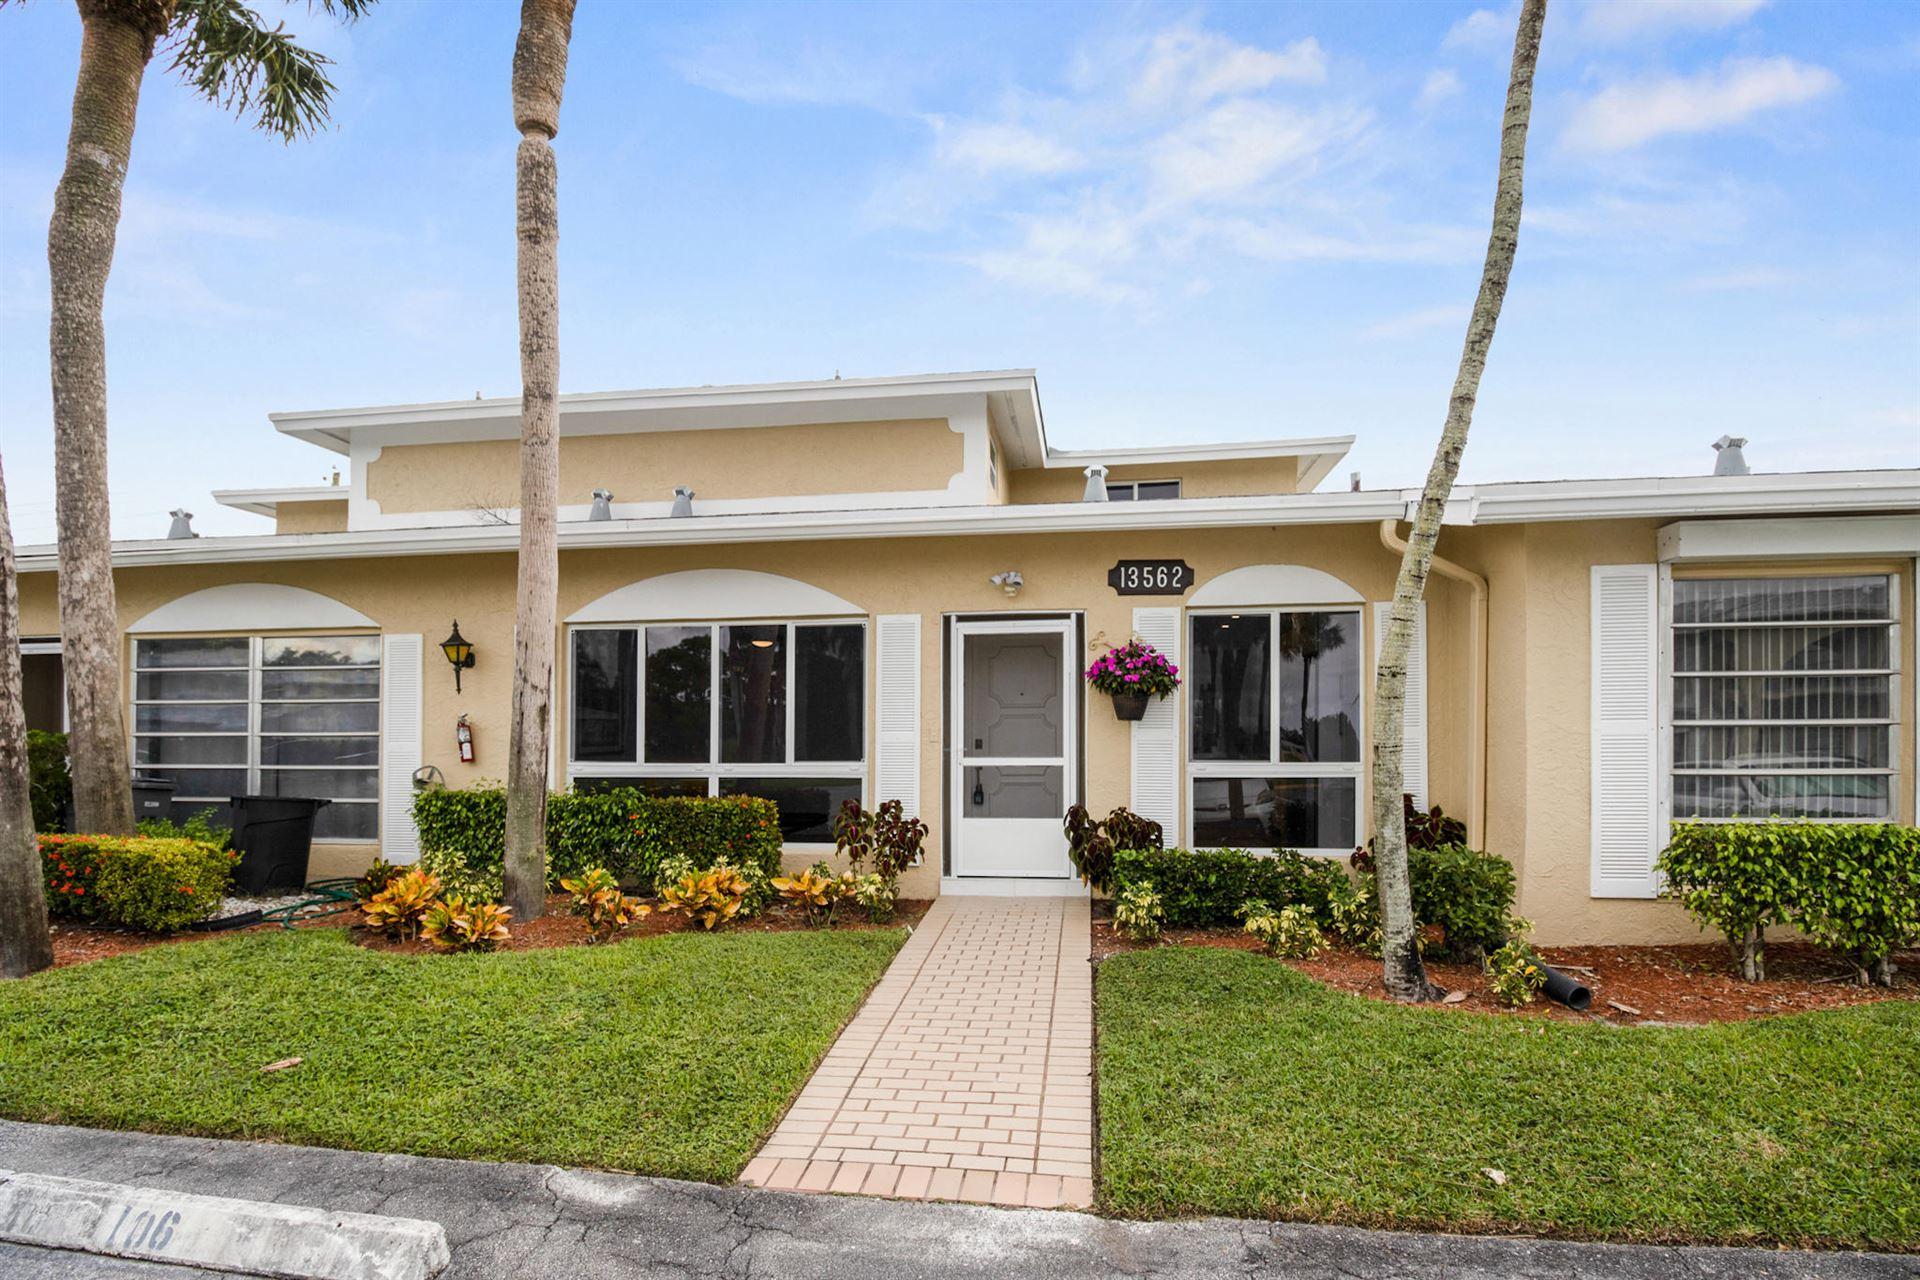 13562 Via Flora #C, Delray Beach, FL 33484 - #: RX-10664263